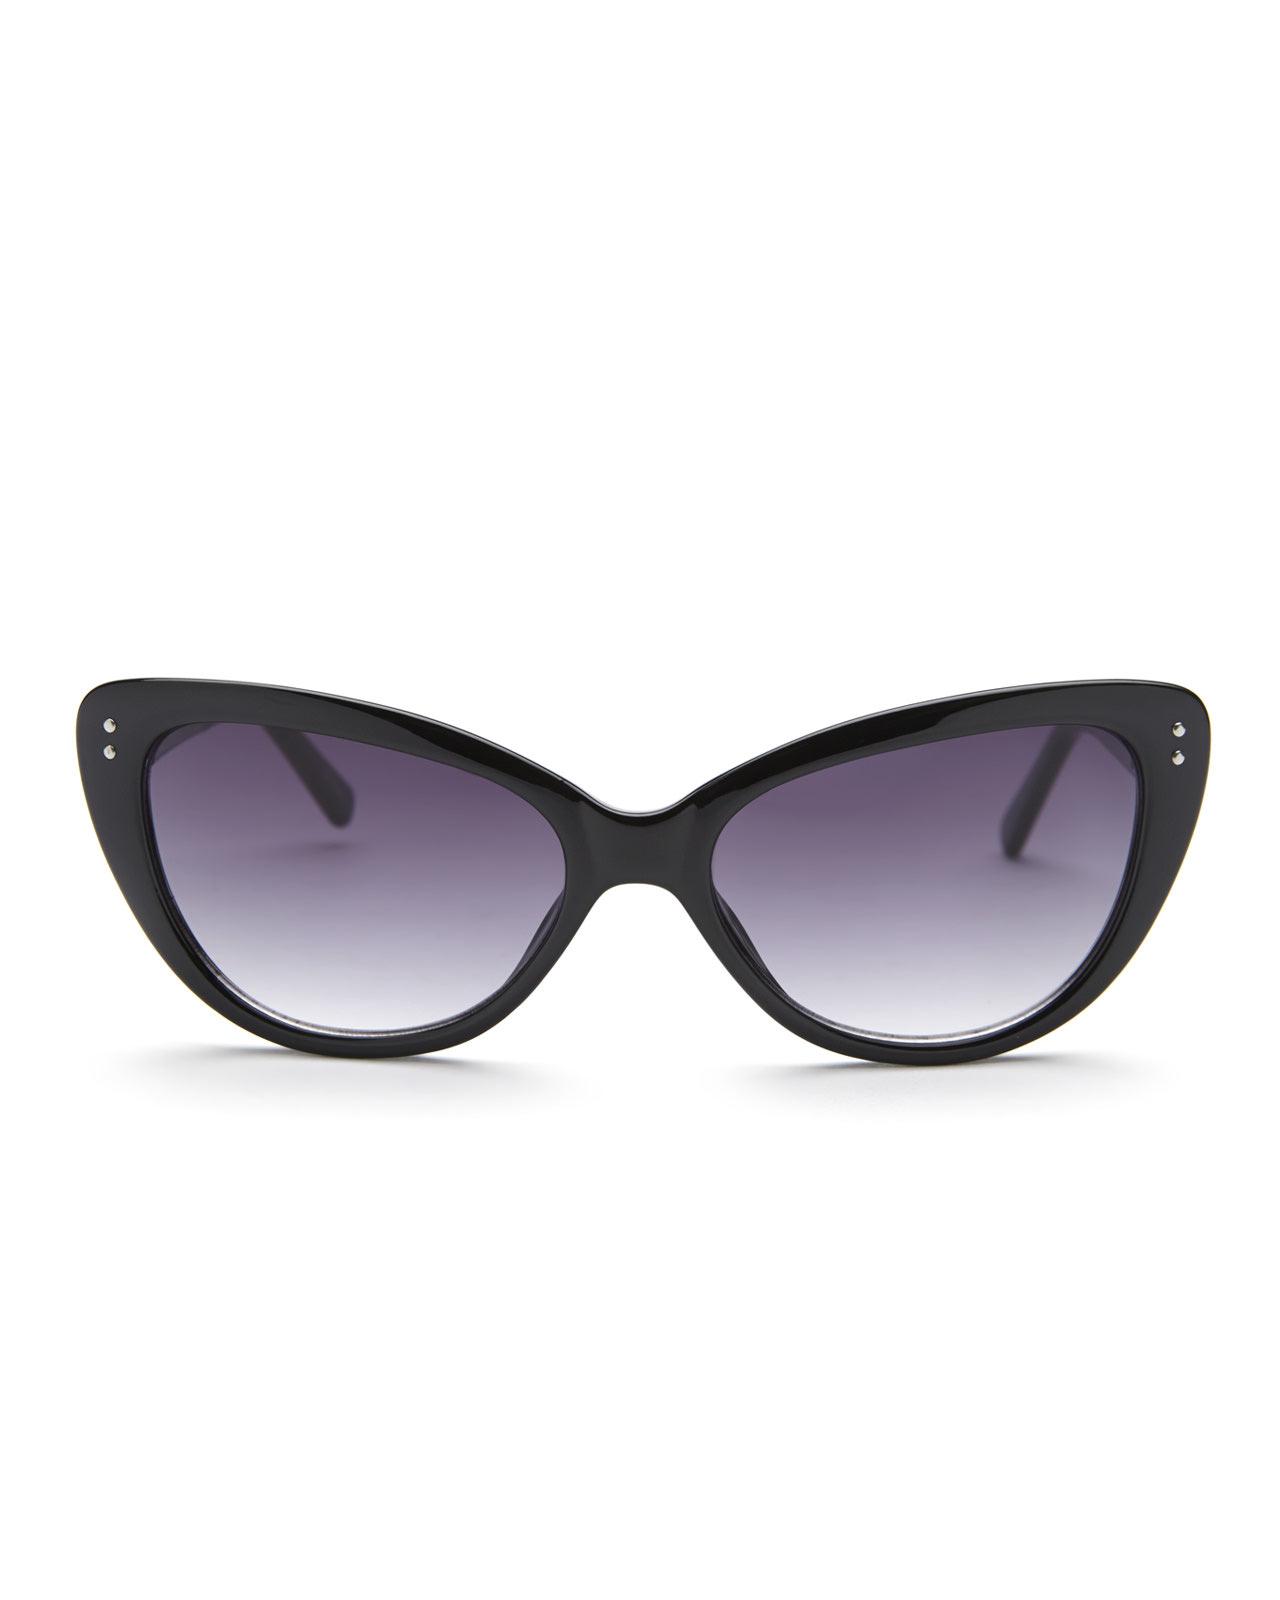 Cole Haan Cat Eye Sunglasses